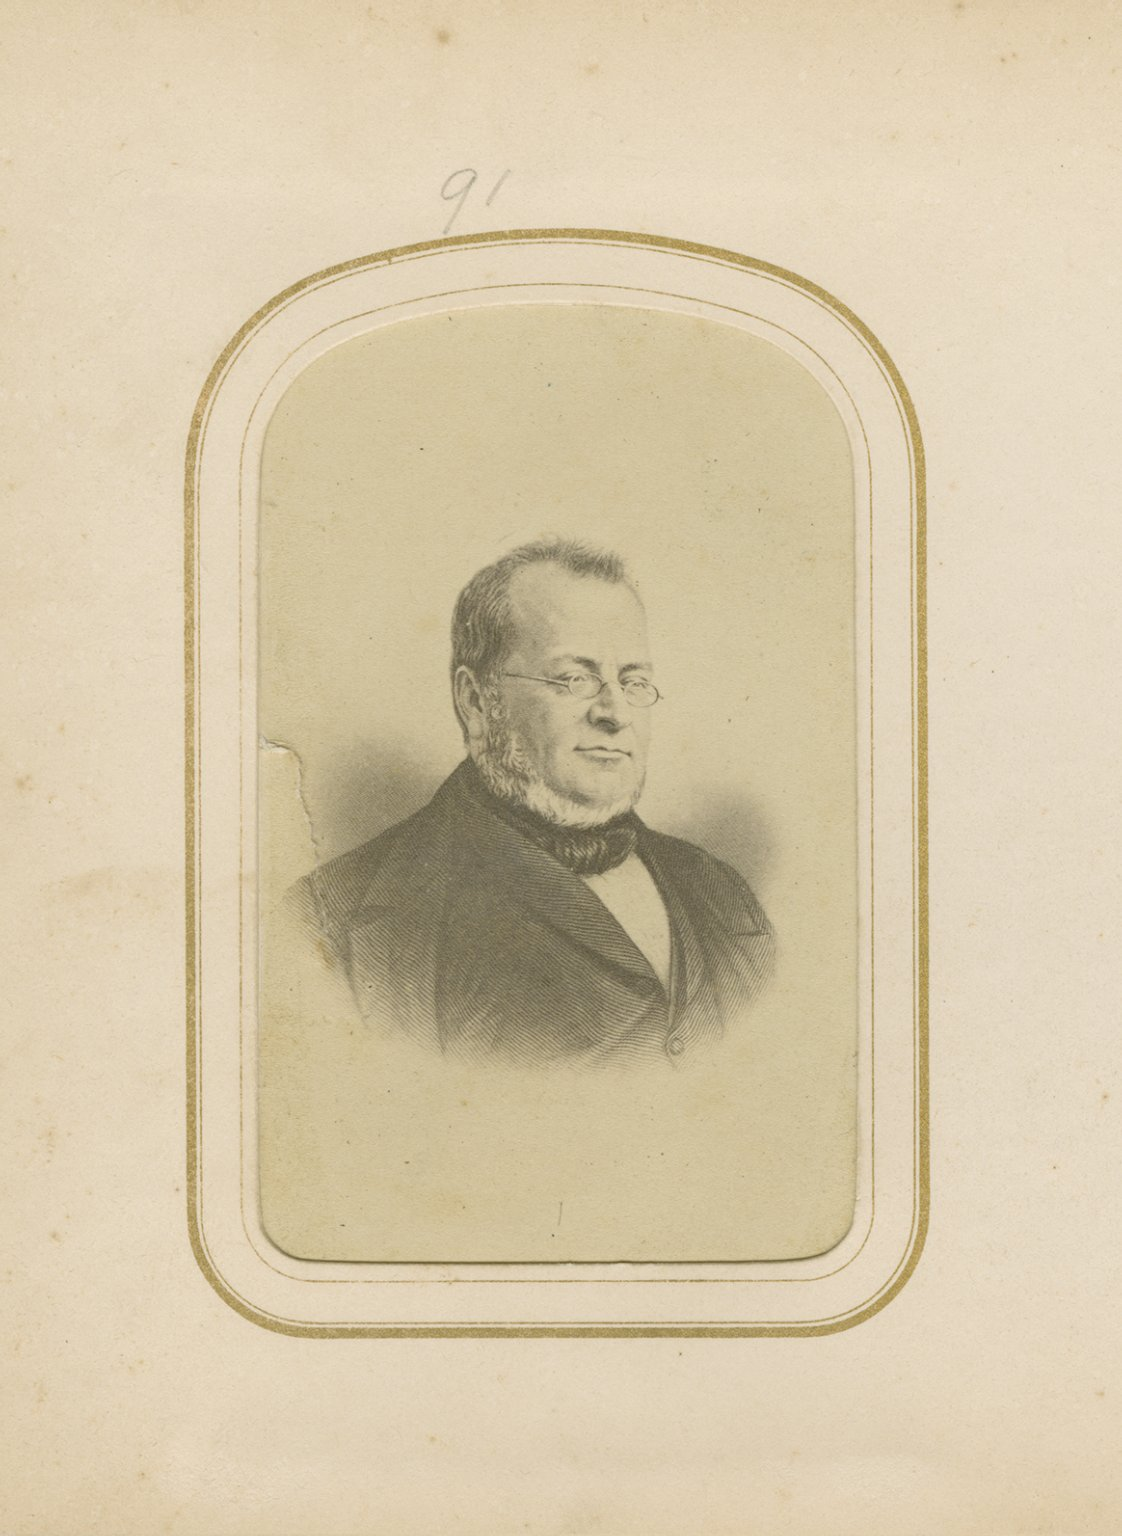 Count Cavour